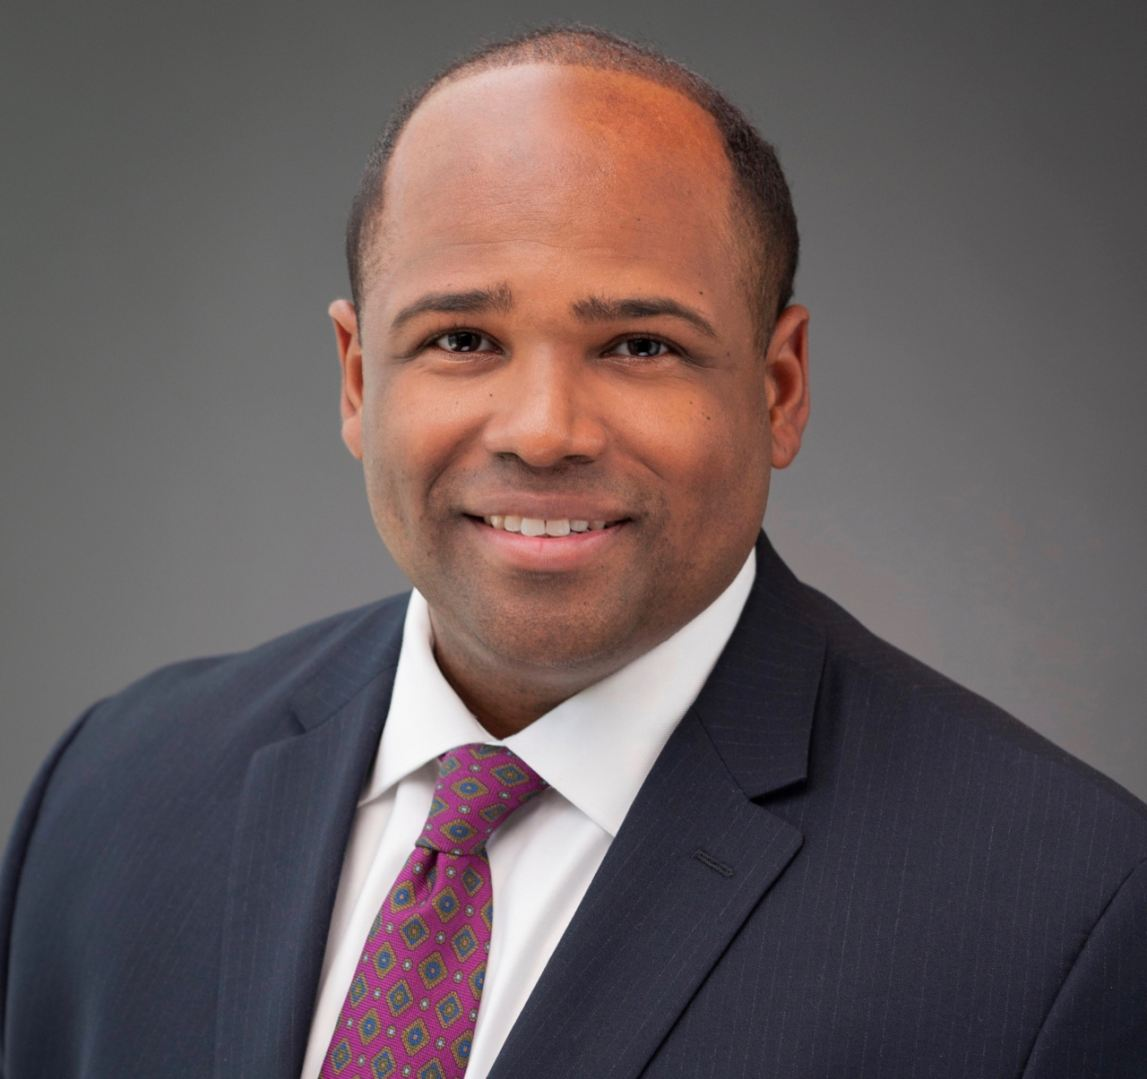 New Executive Director Elijah Williams will lead The Energy Corridor District.